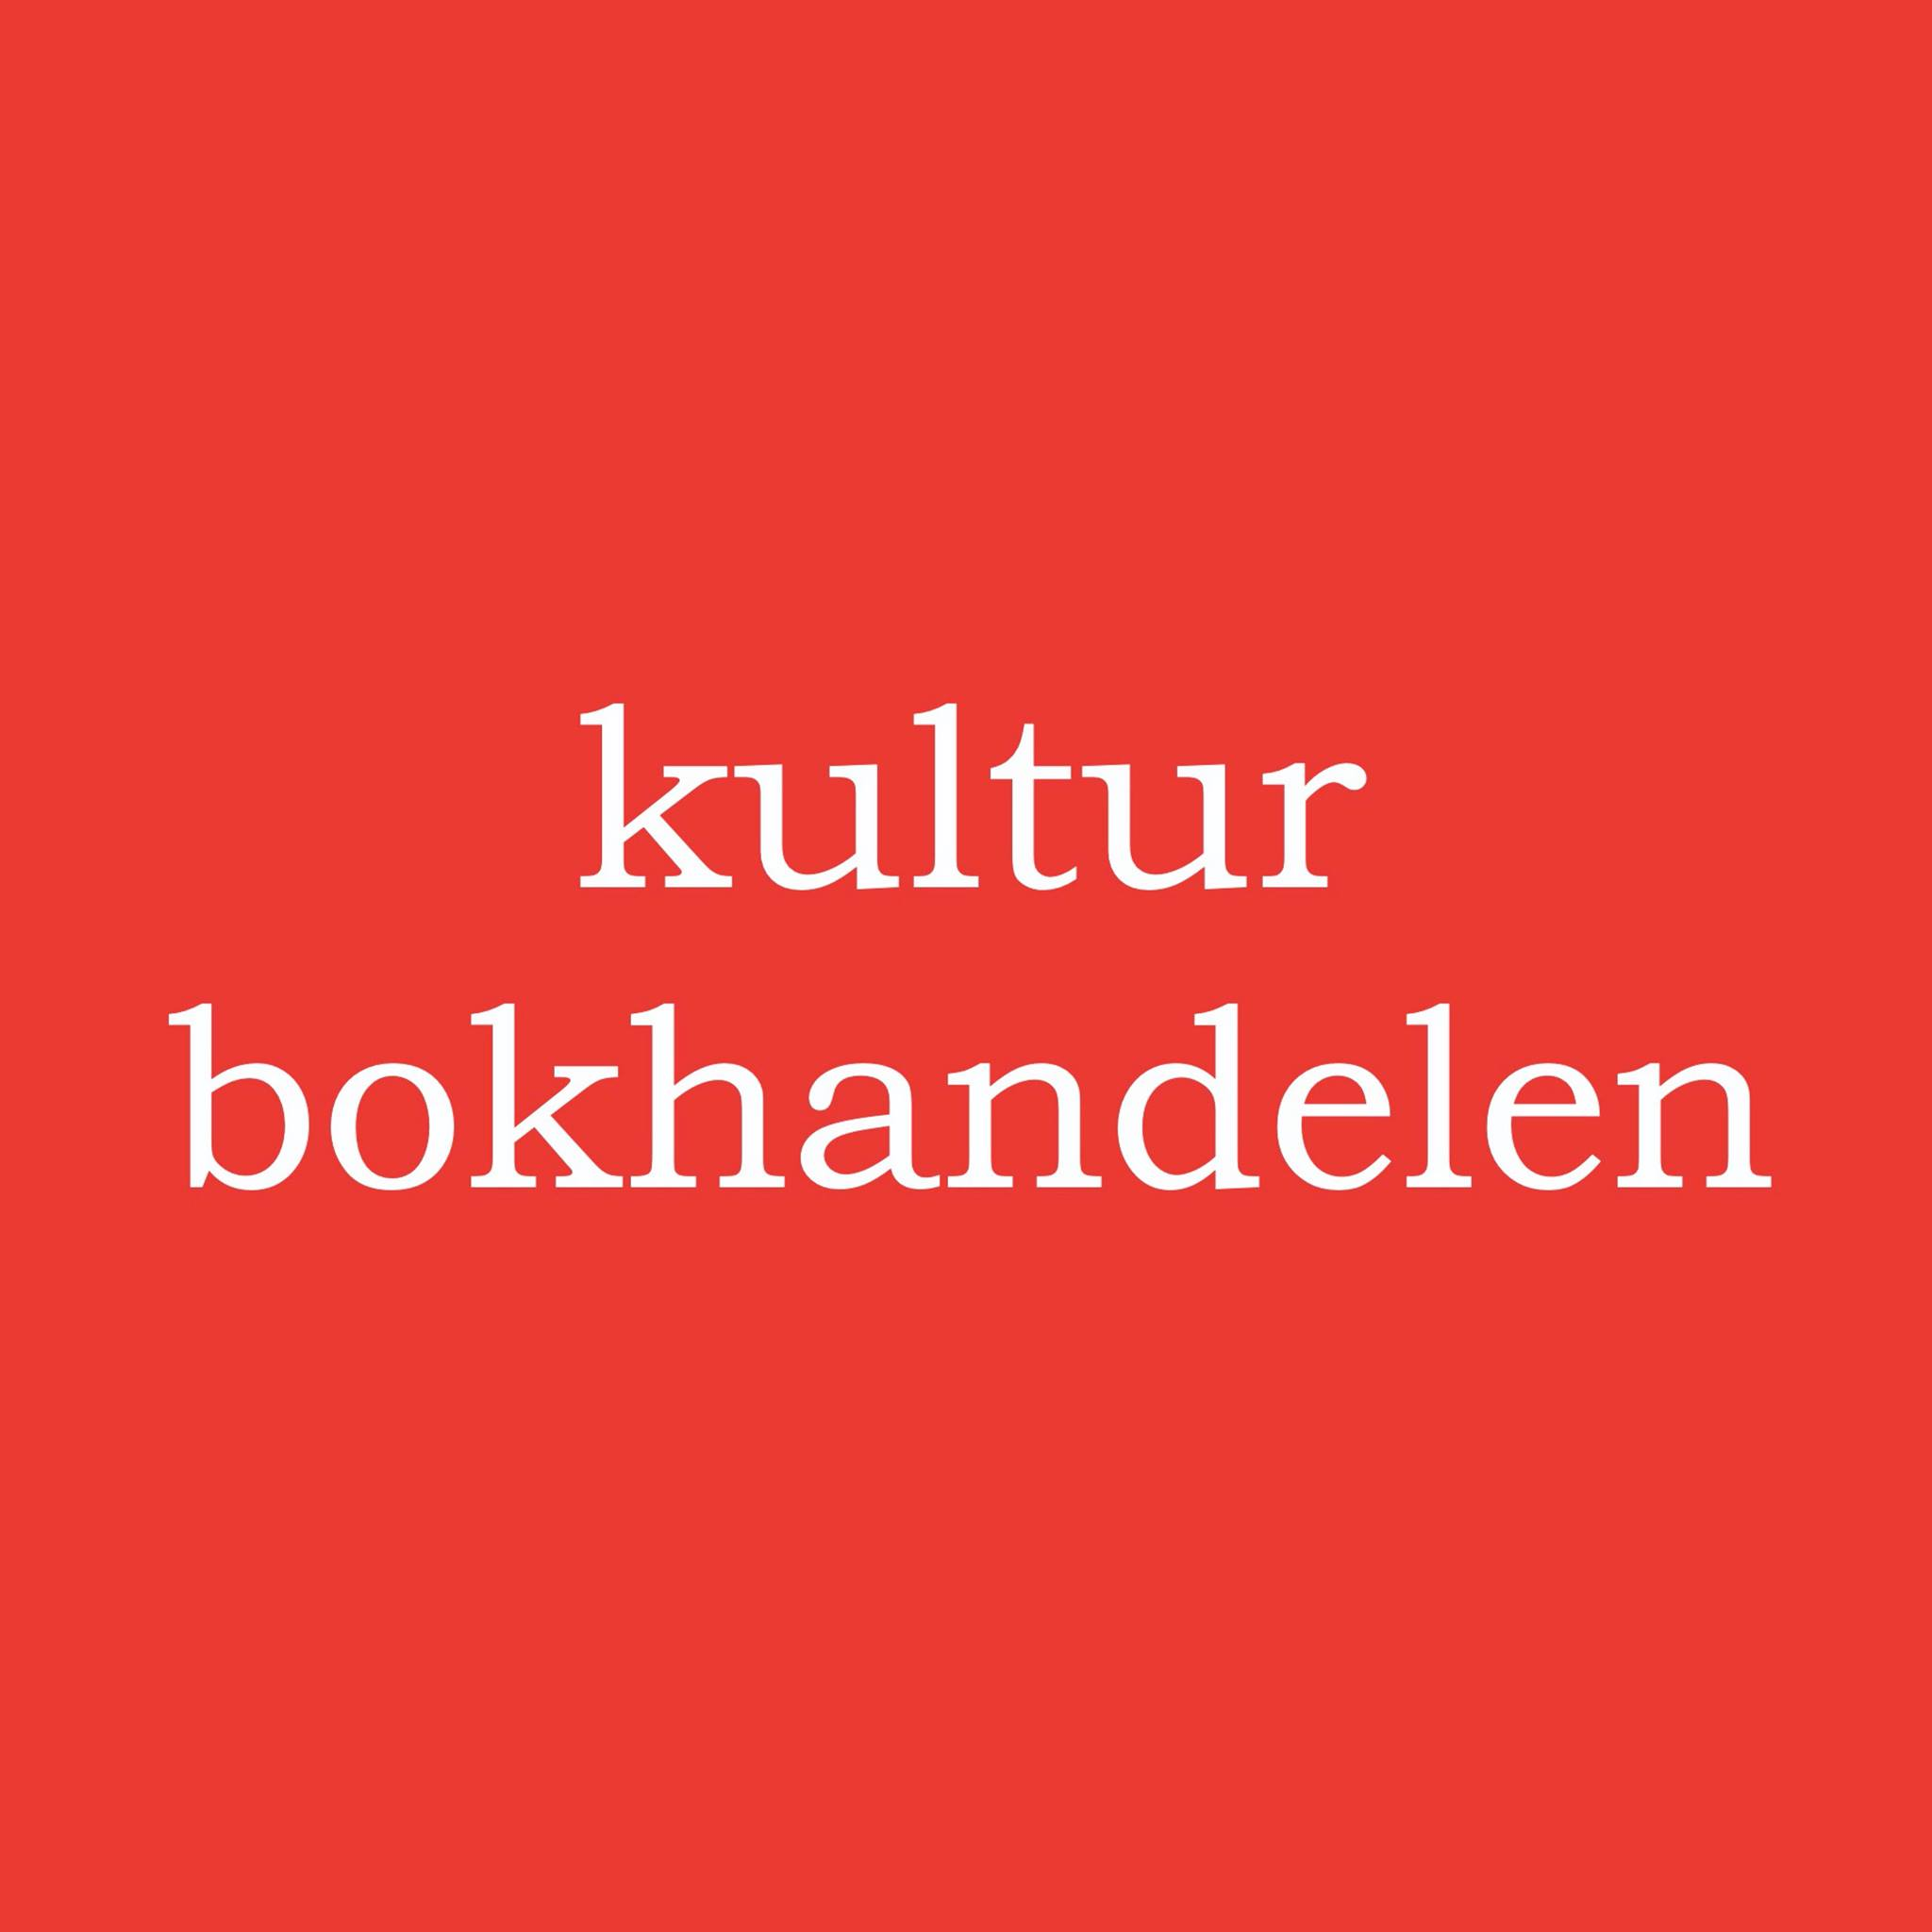 https://shopinfarsund.no/farsundlibris/wp-content/uploads/sites/51/2021/04/profilbilde-fb-kulturbokhandelen.jpg